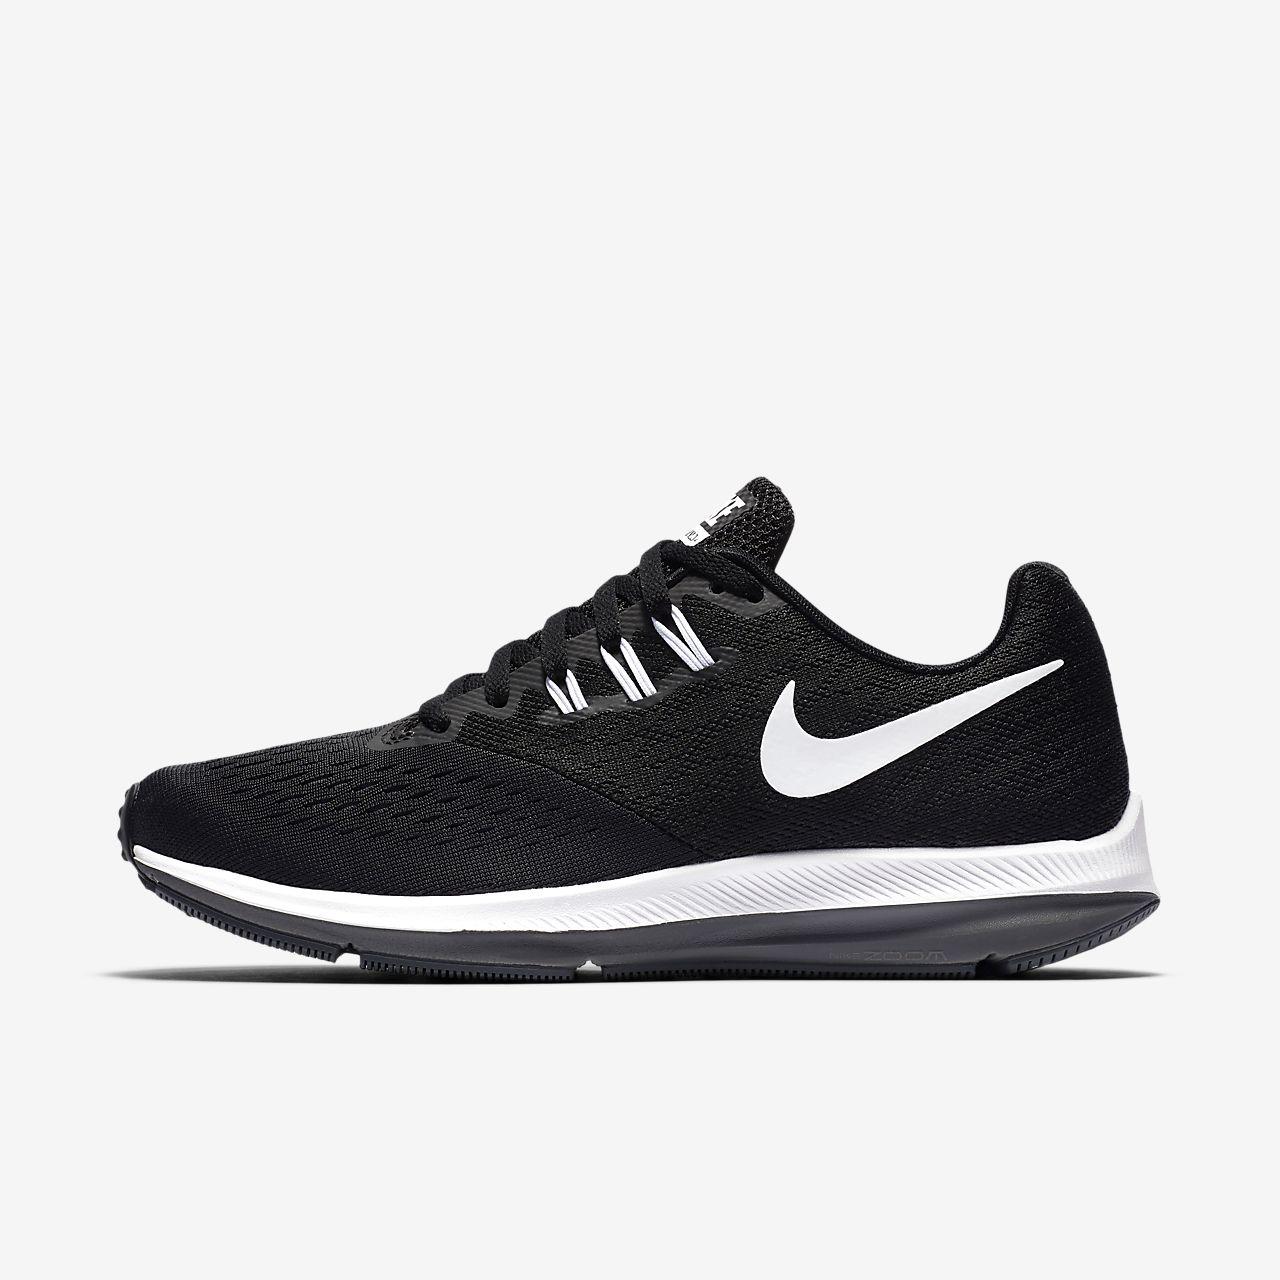 Nike Zoom inizio Scarpe Da Corsa Tg UK 4 EU 37.5